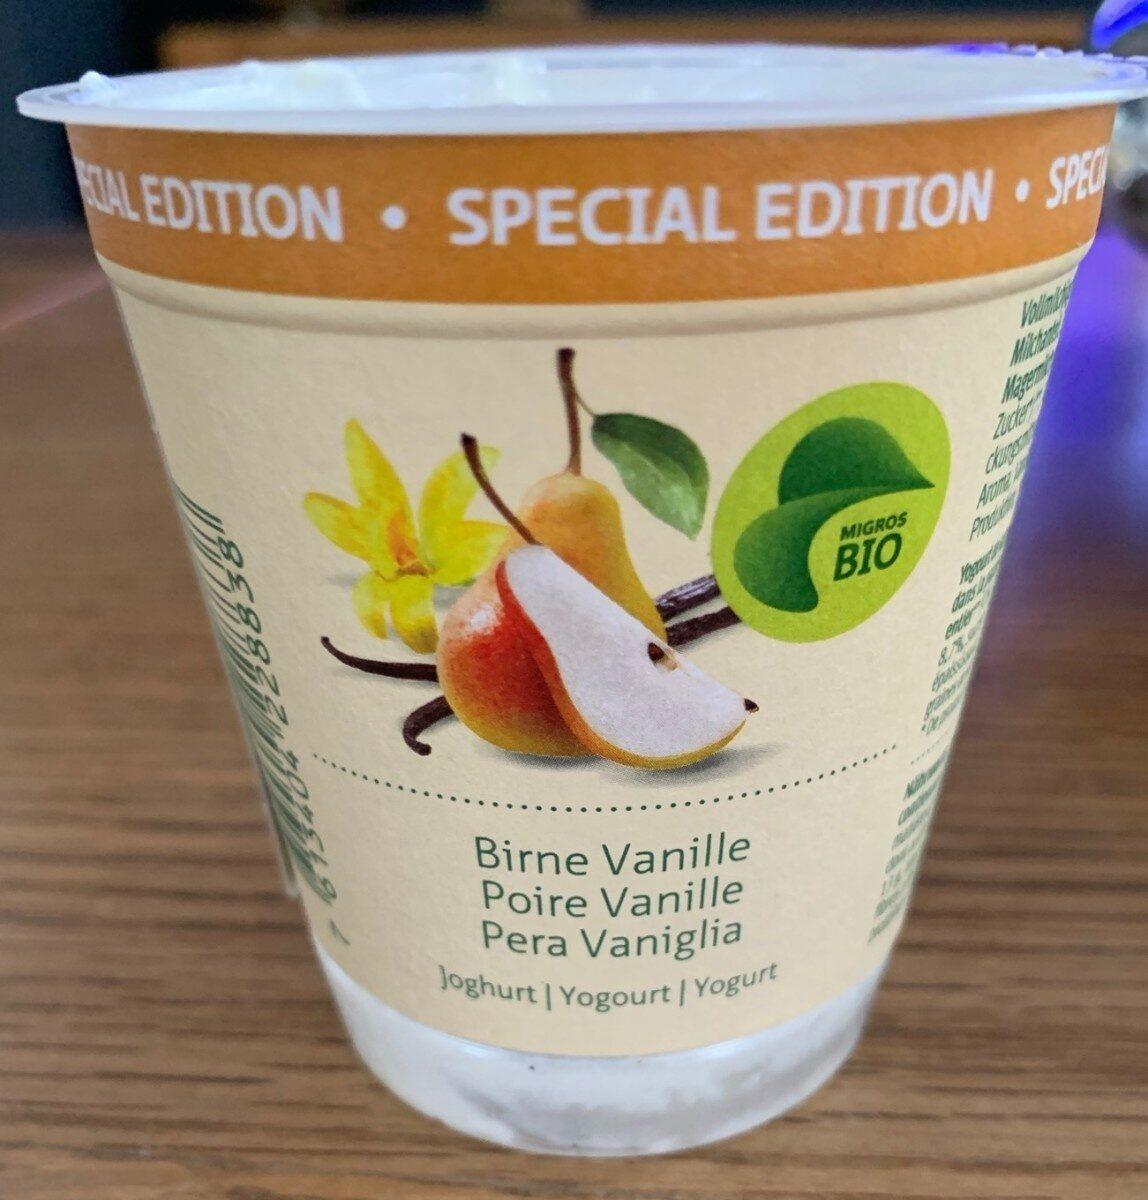 Poire vanille - Product